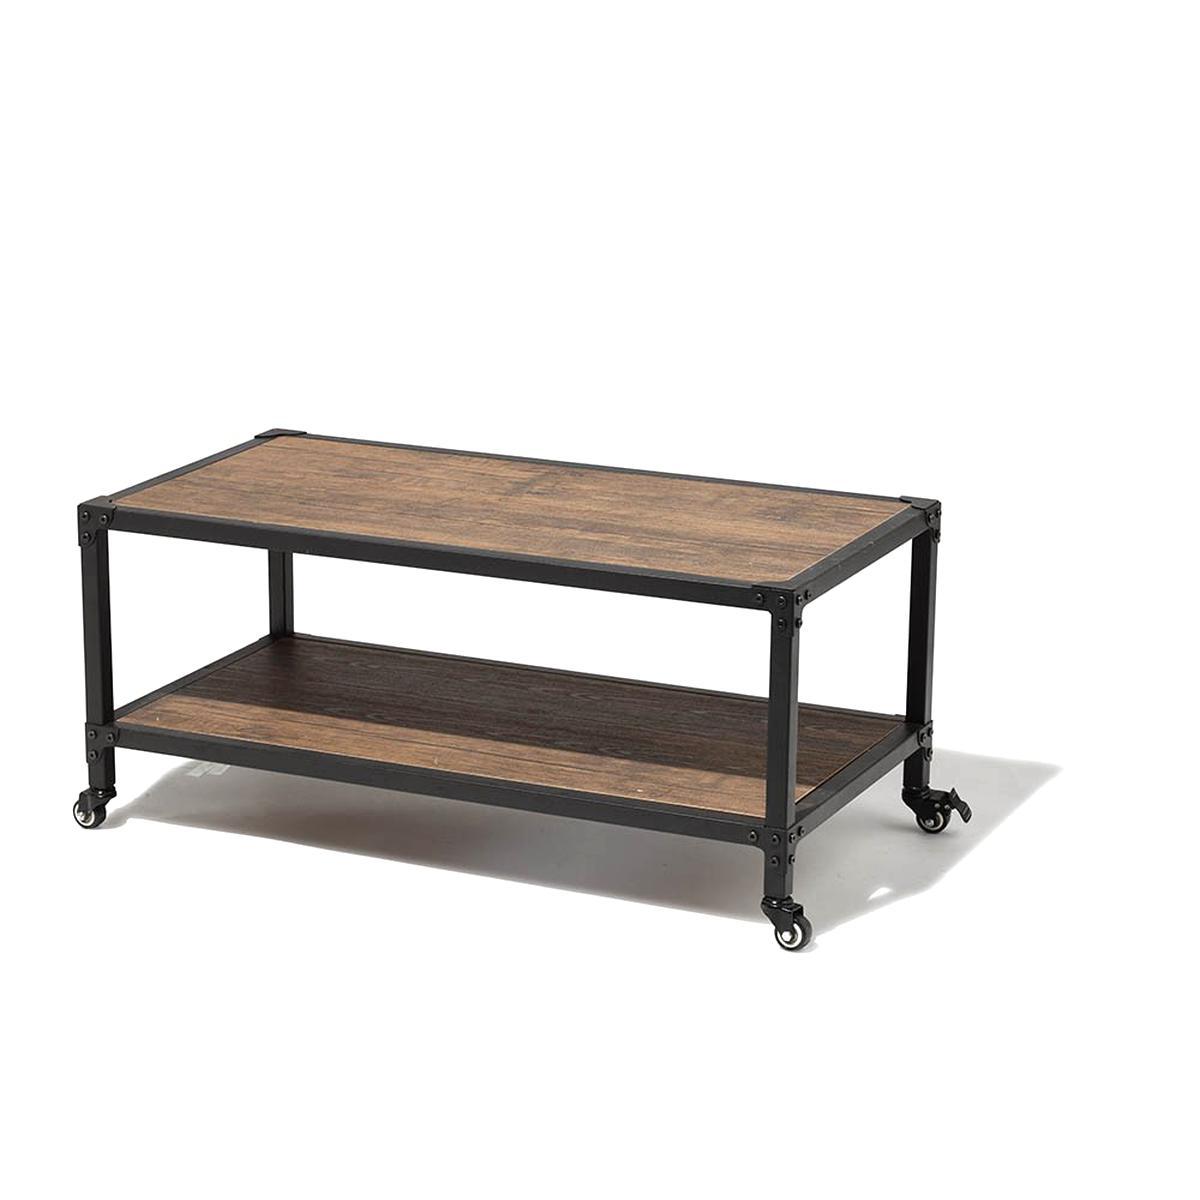 nouvelle arrivee Design moderne plutôt cool Table Basse Roulettes d'occasion